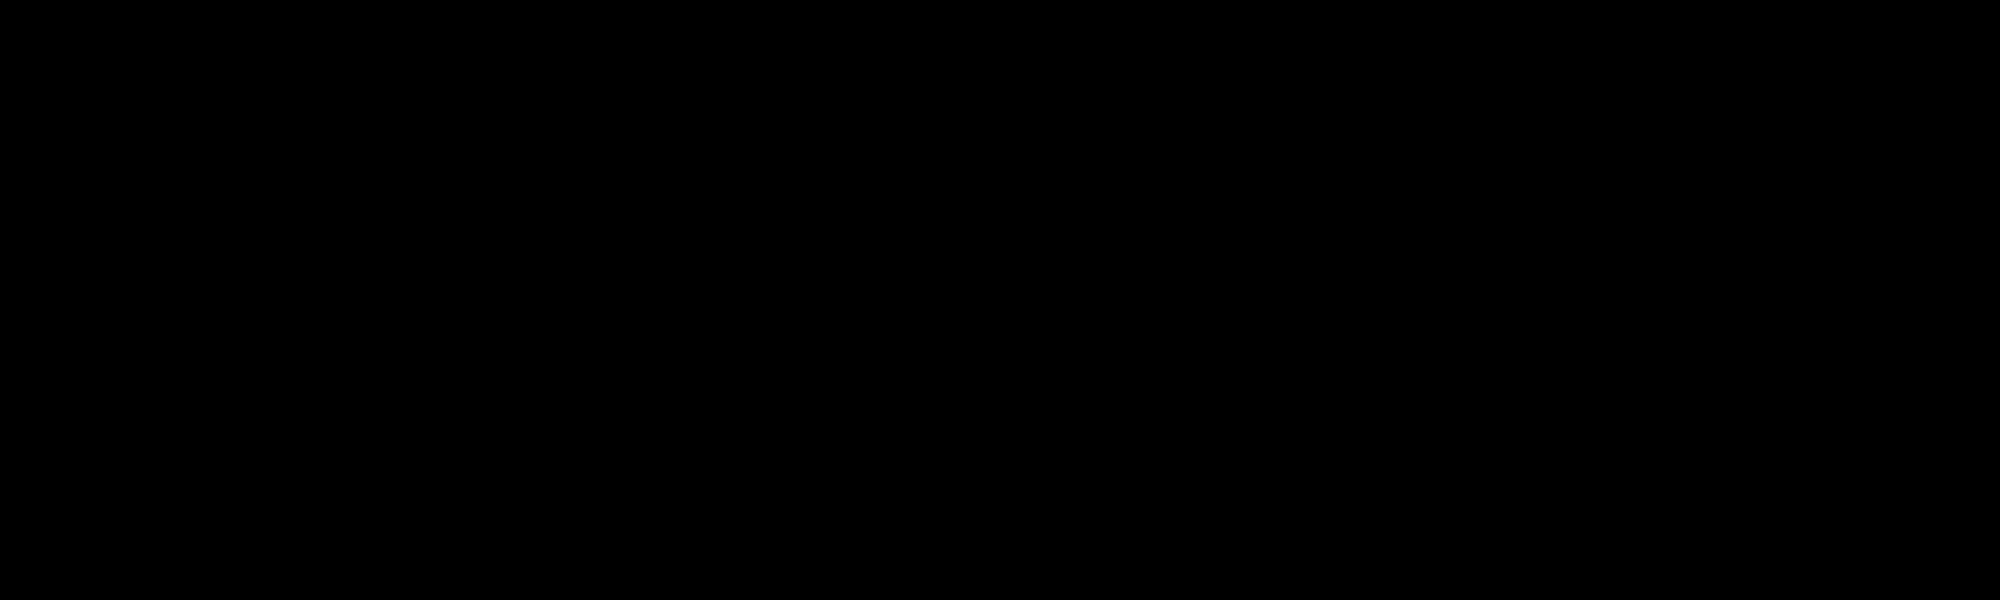 VaporShell